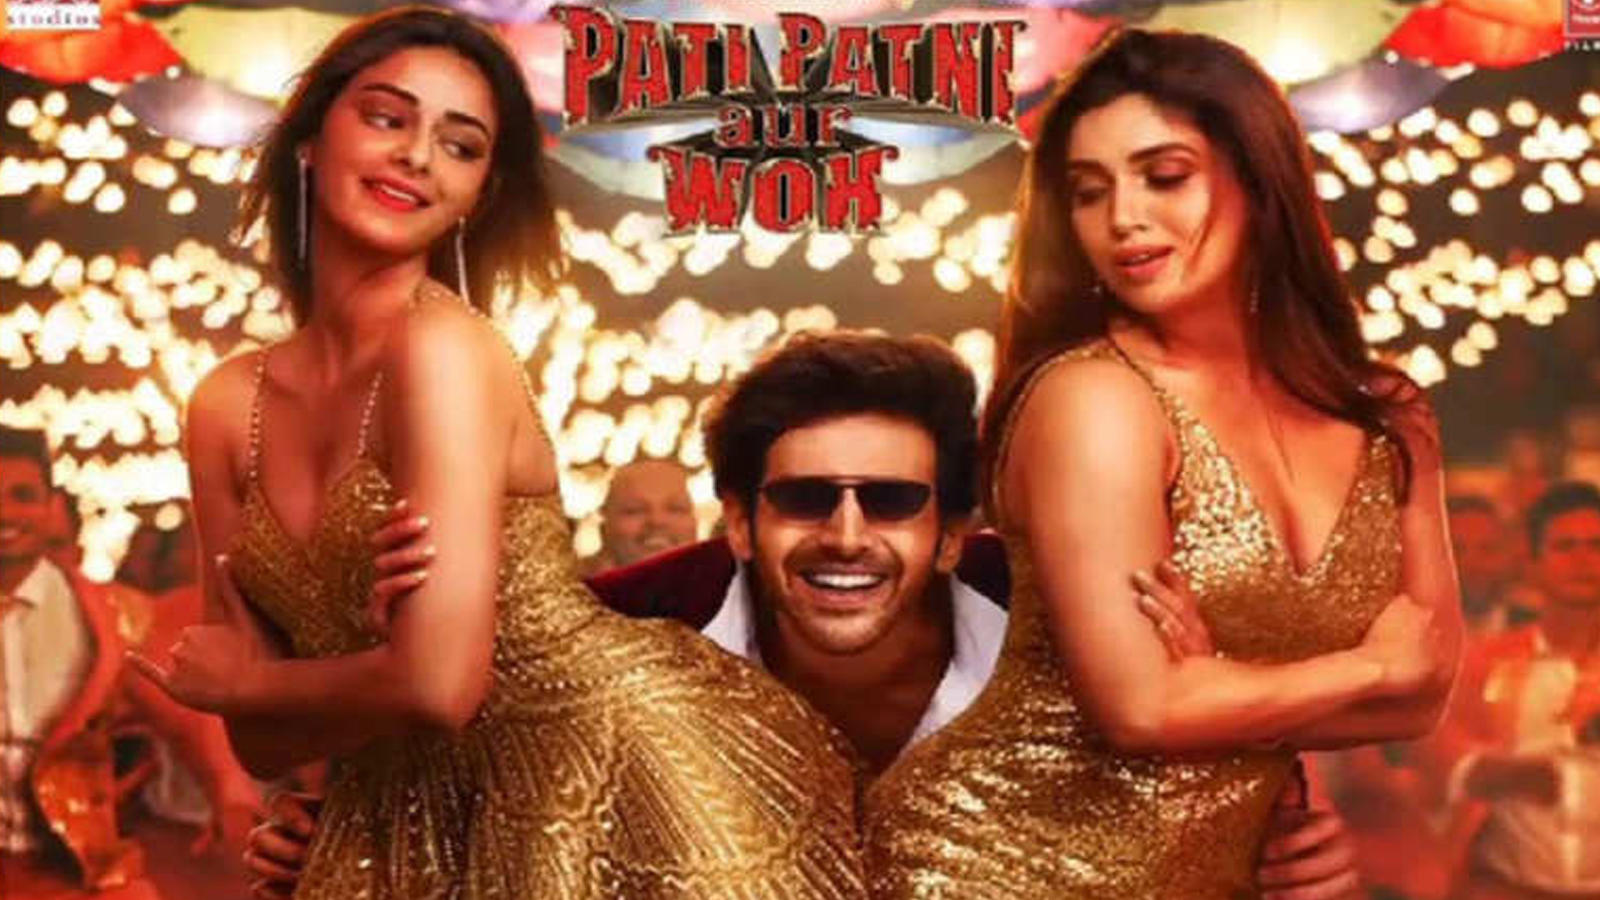 Pati Patni Aur Woh: Public Review of Kartik Aaryan, Ananya Panday, Bhumi Pednekar's comedy-drama